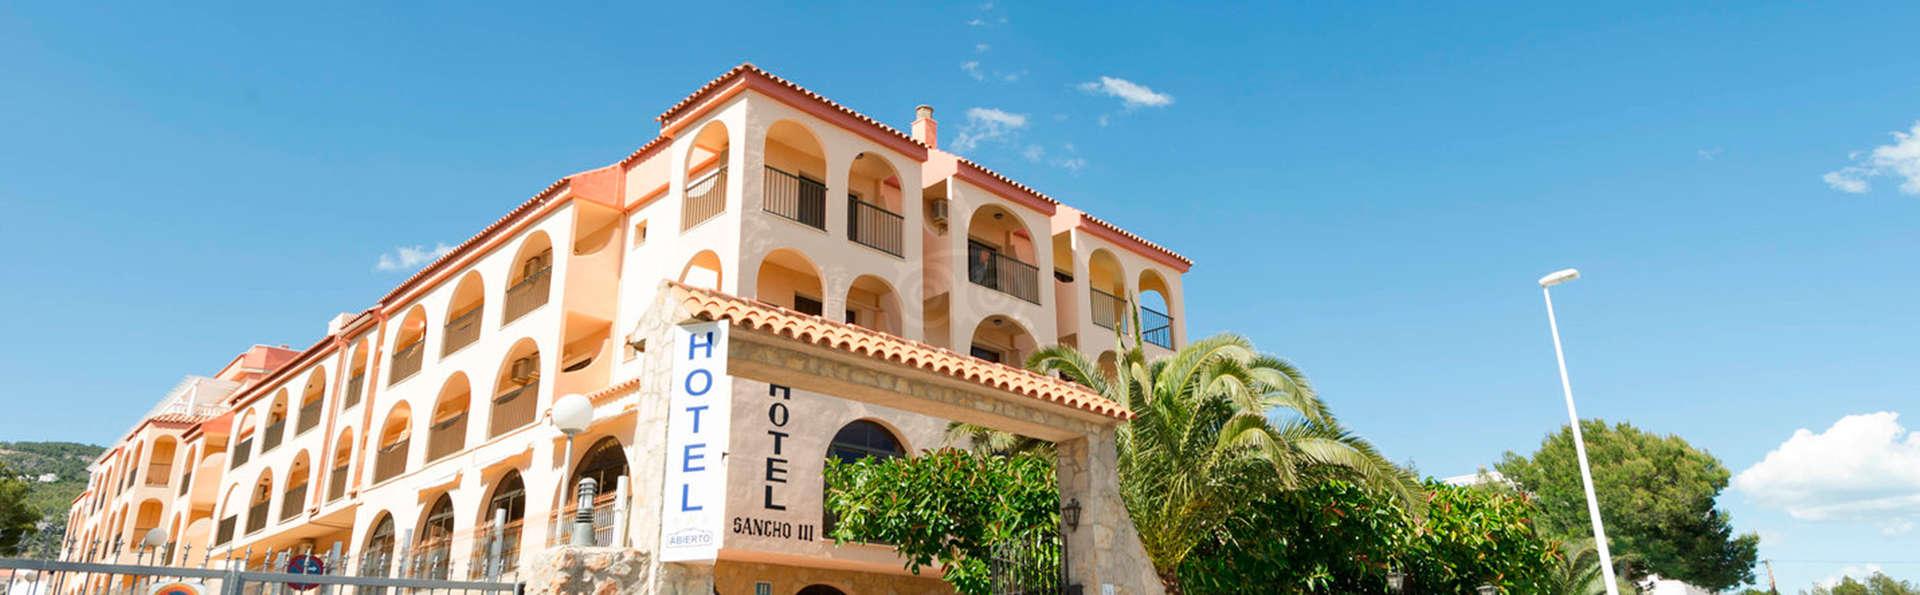 Hotel Sancho III - EDIT_front.jpg